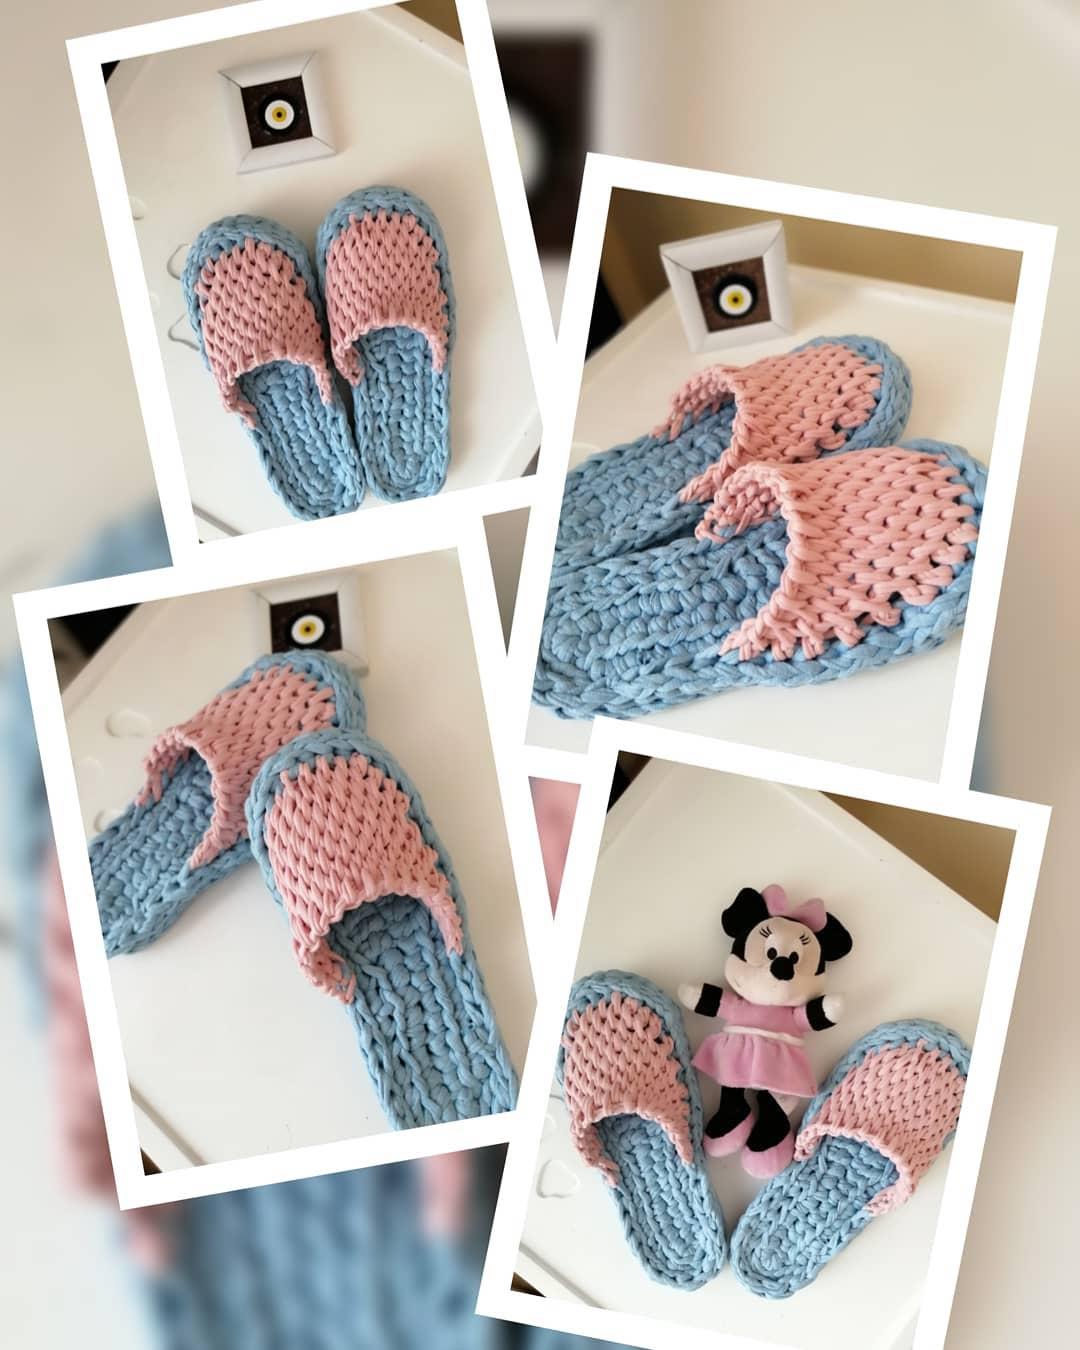 Terliğin Resimli Hali Knitting Handmad Handmade - Knitting Bag